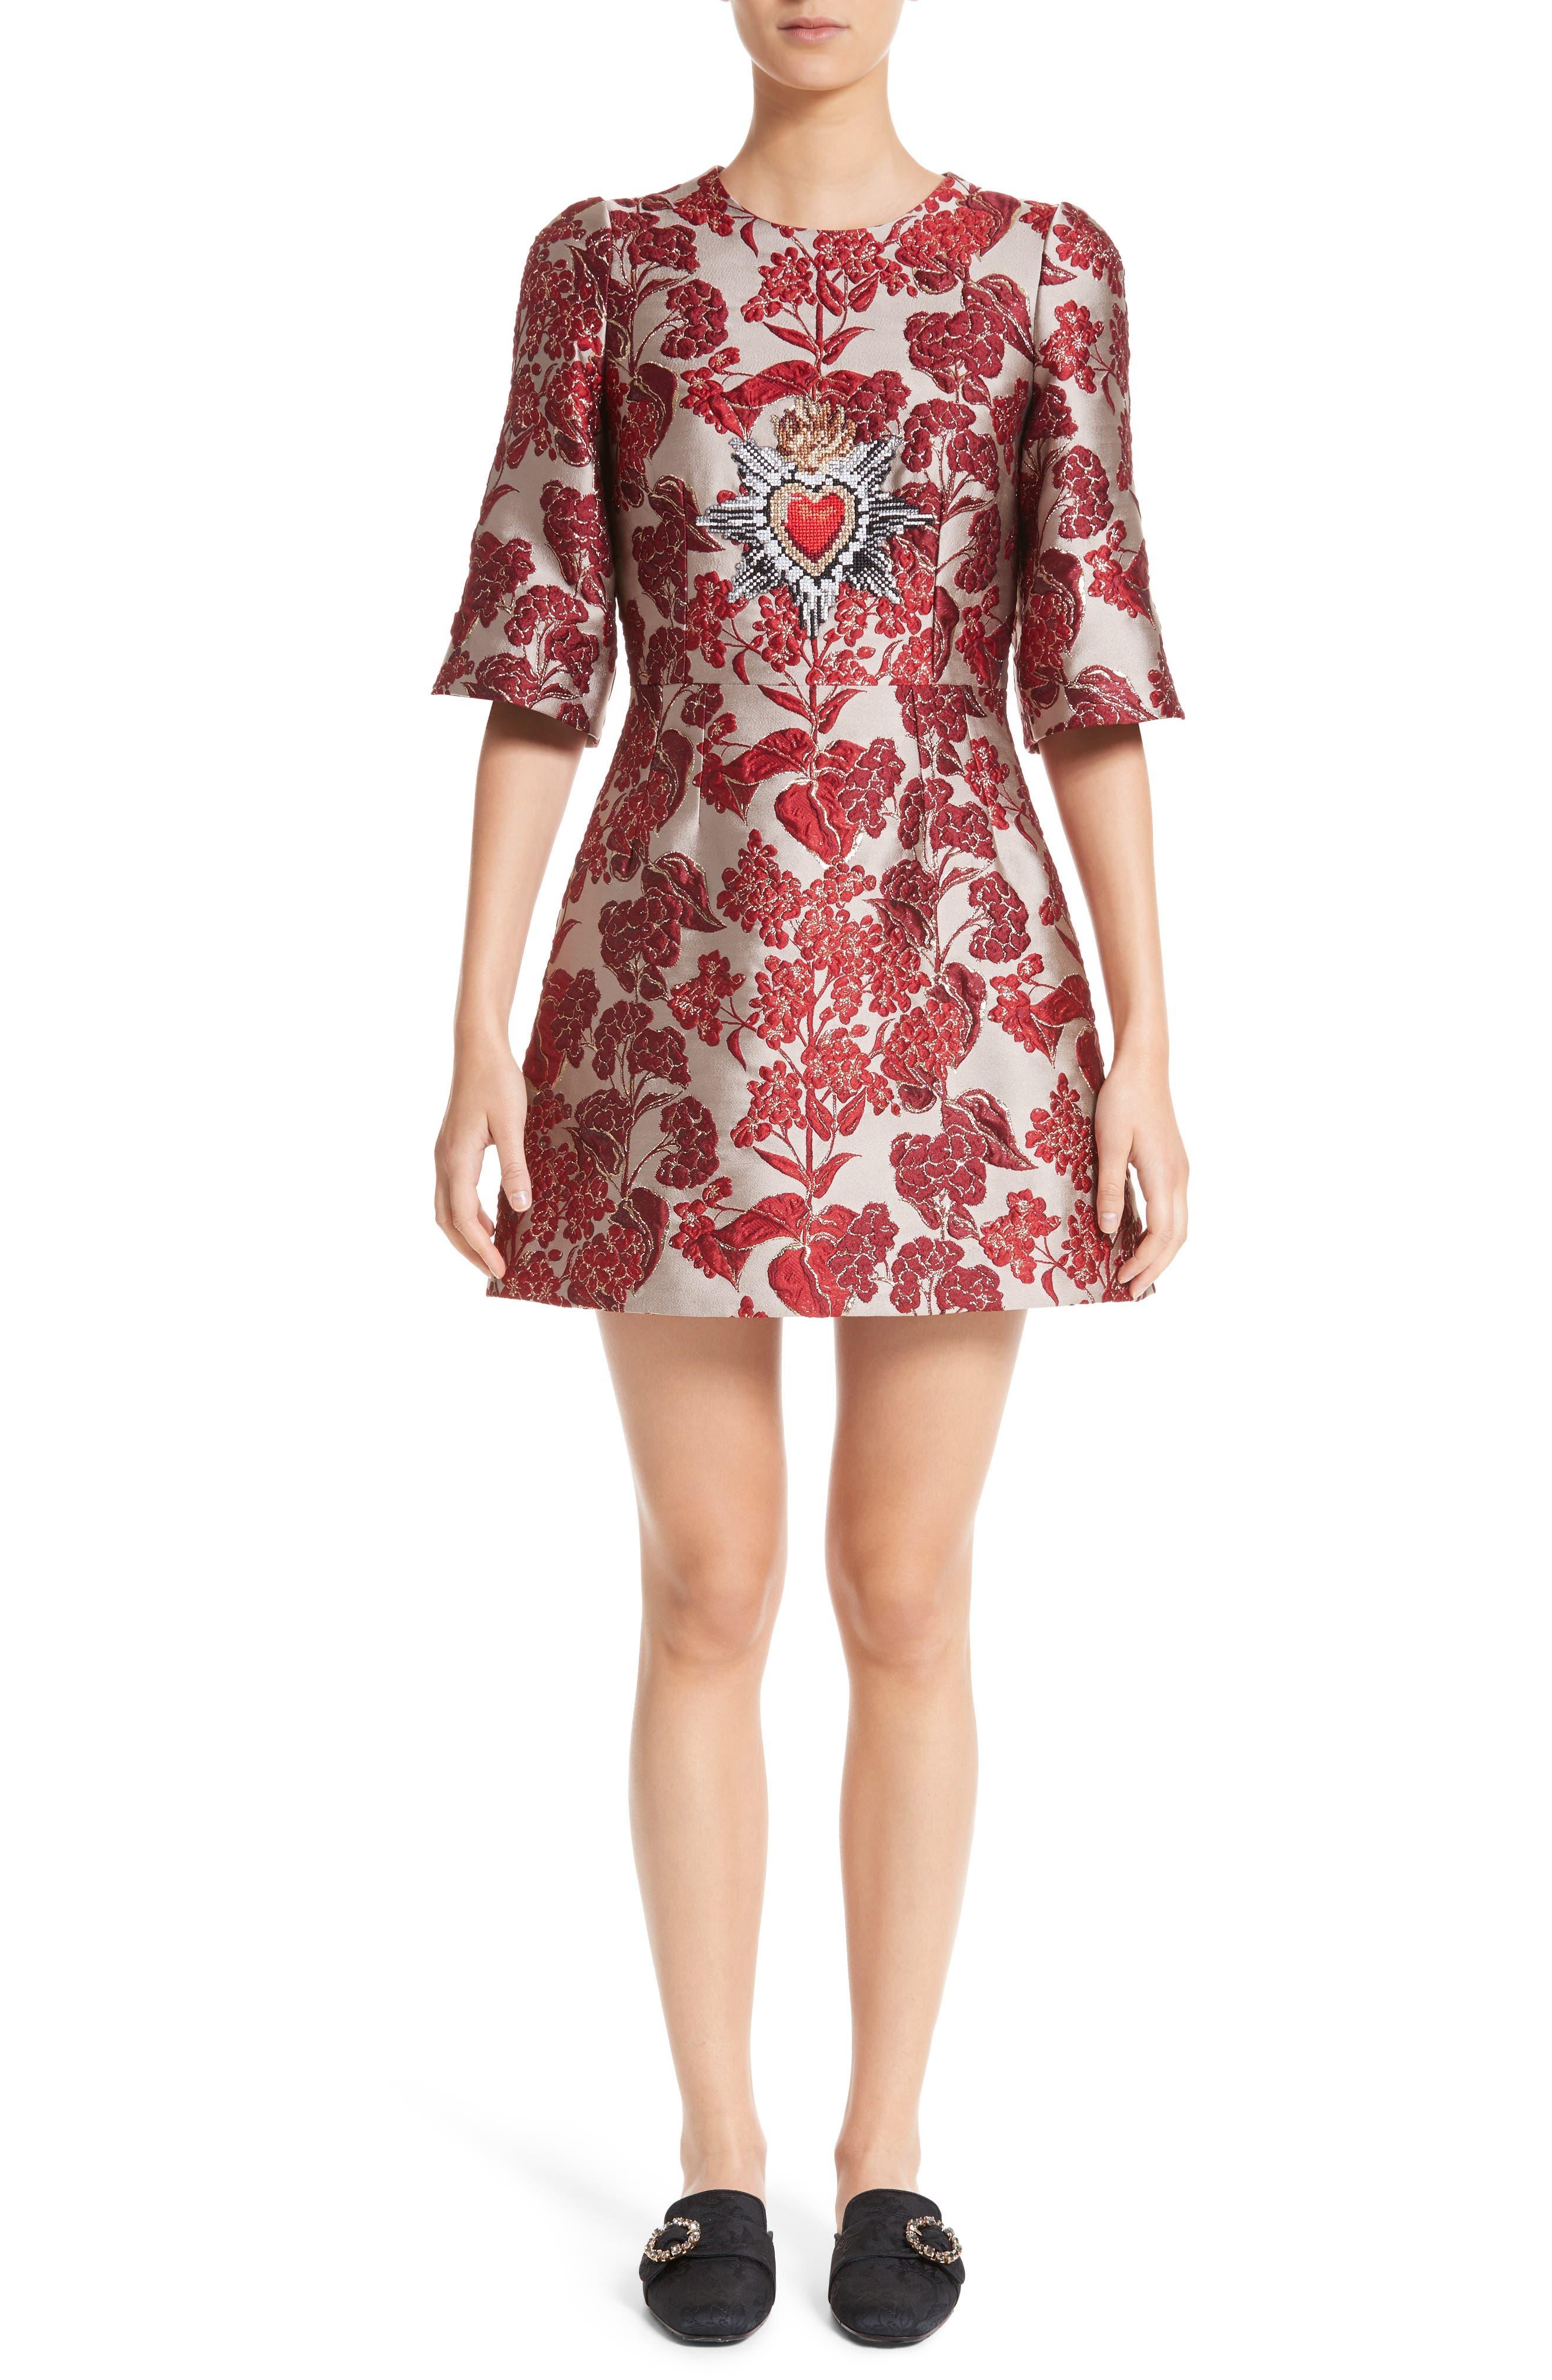 Dolce&Gabbana Crest Floral Jacquard Dress